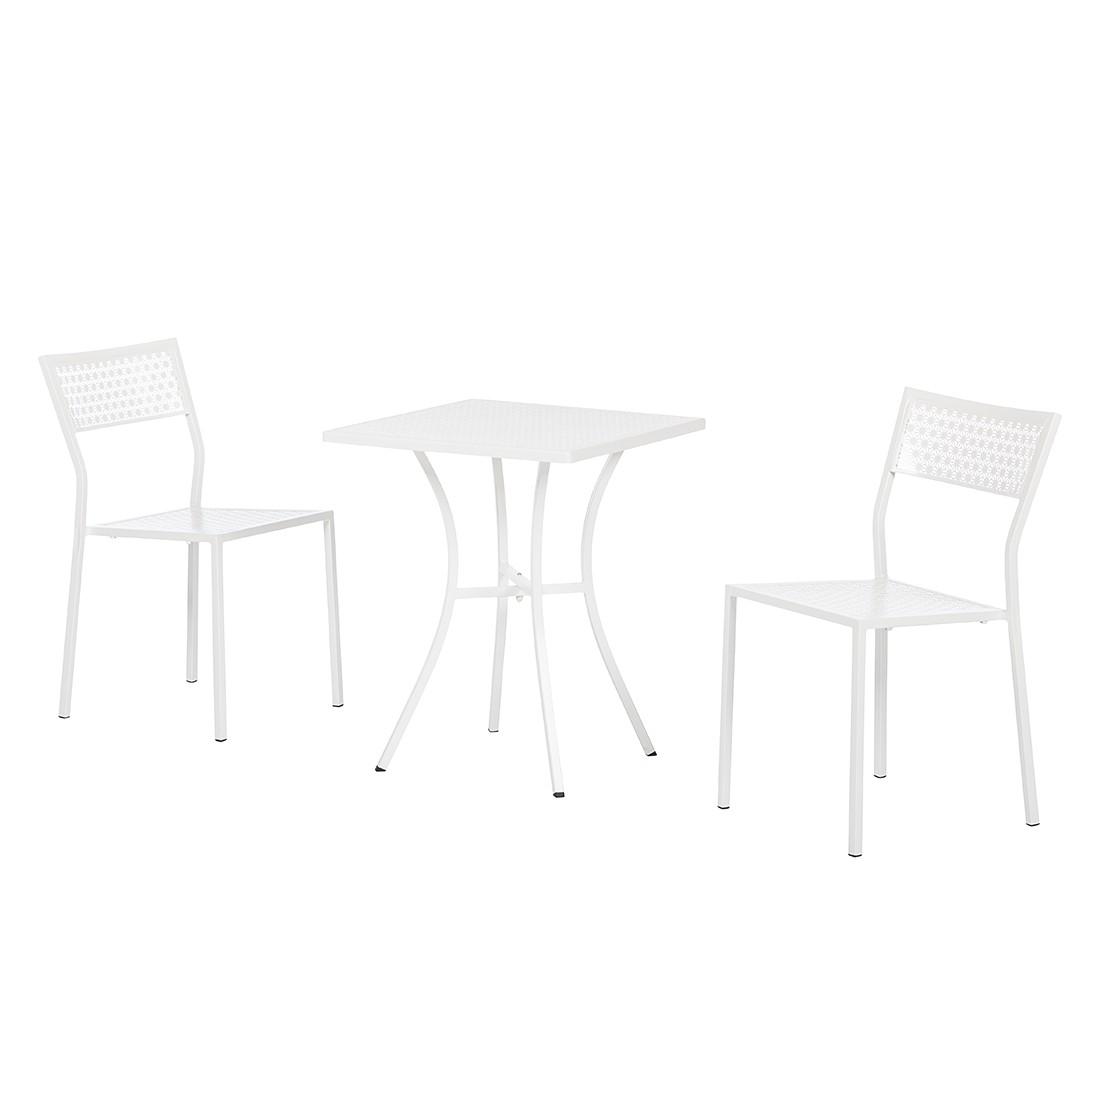 Balkonmöbelset Pini (3-teilig) - Stahl Weiß, Garden Guerilla